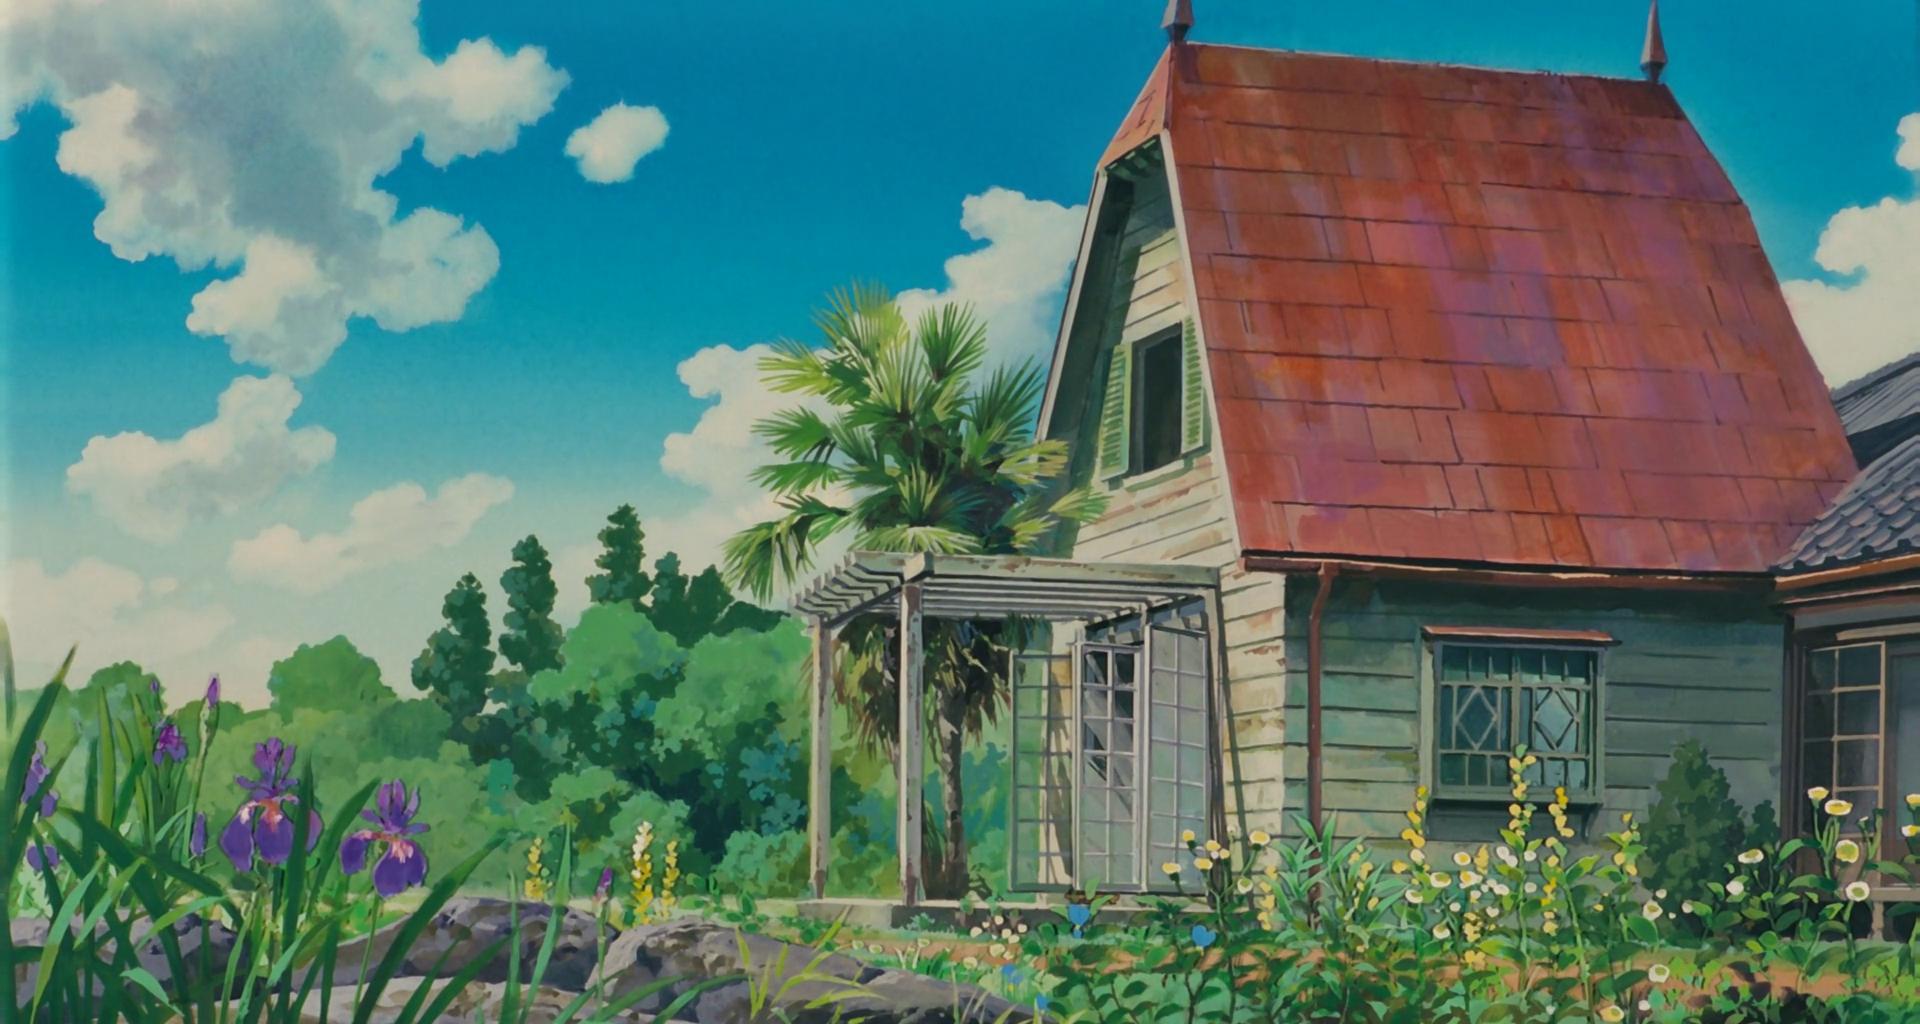 Wallpaper studio ghibli desktop background 1920x1024